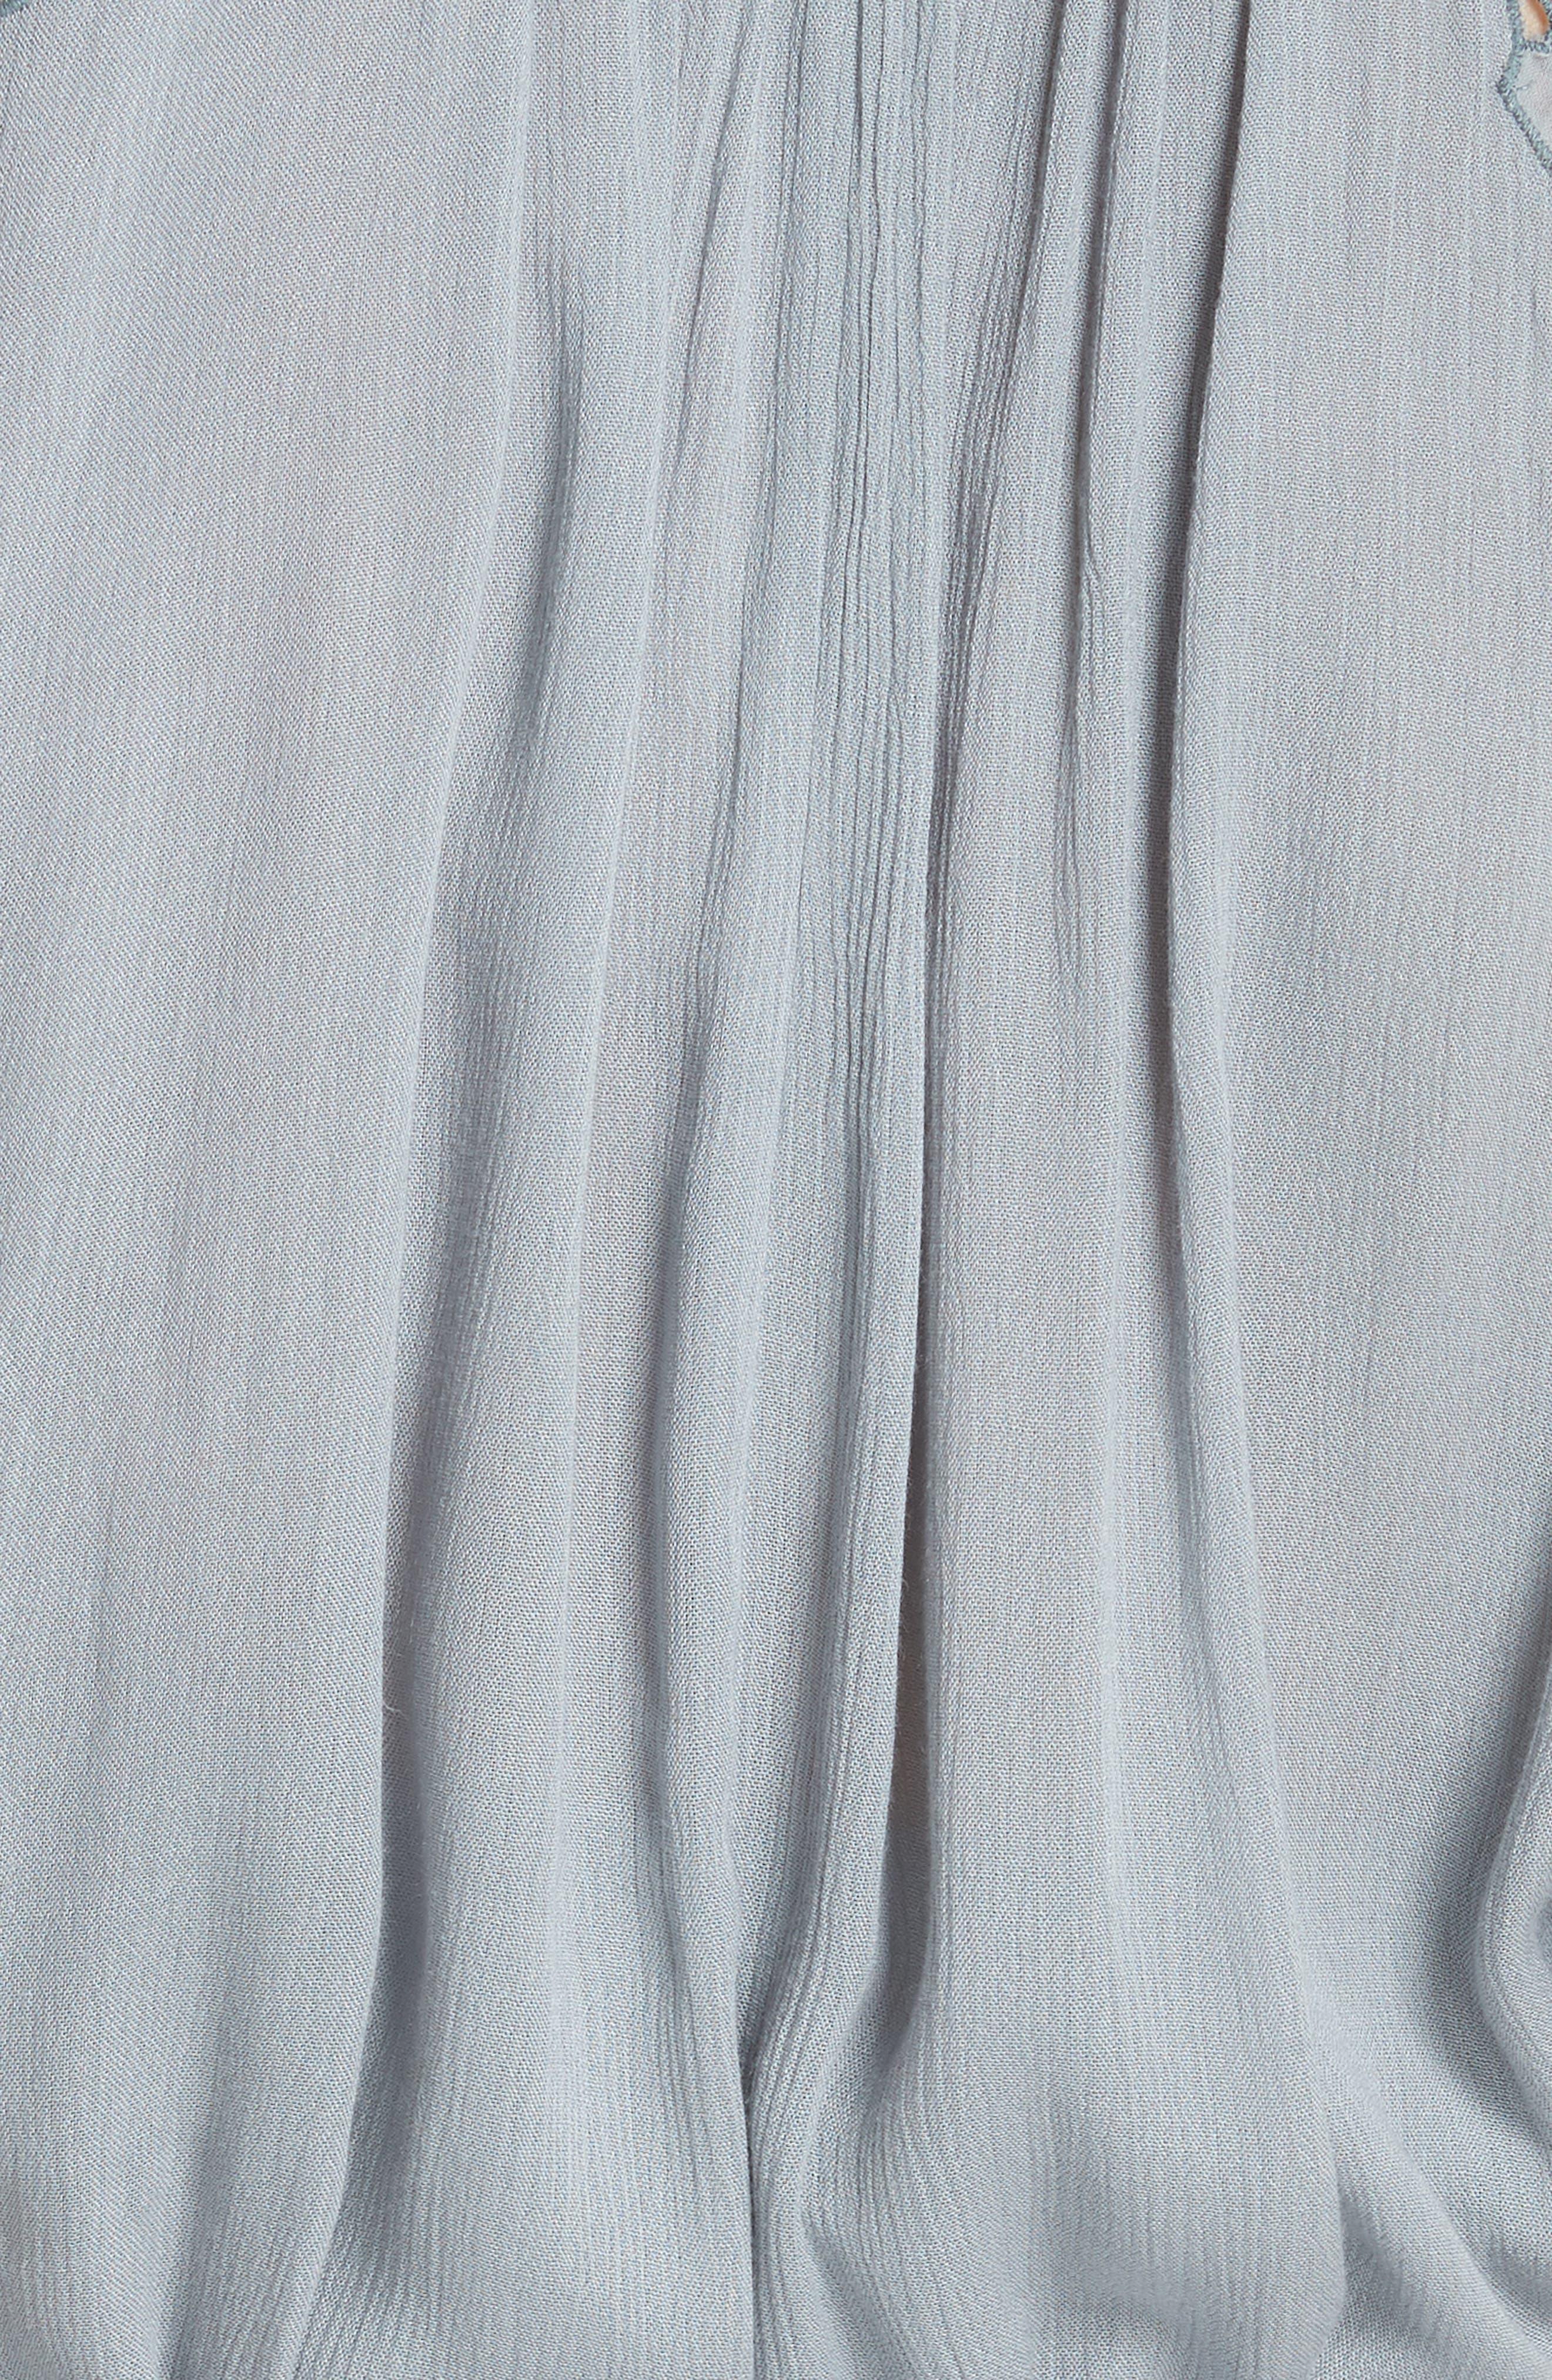 Cut It Out Midi Shirtdress,                             Alternate thumbnail 6, color,                             Blue